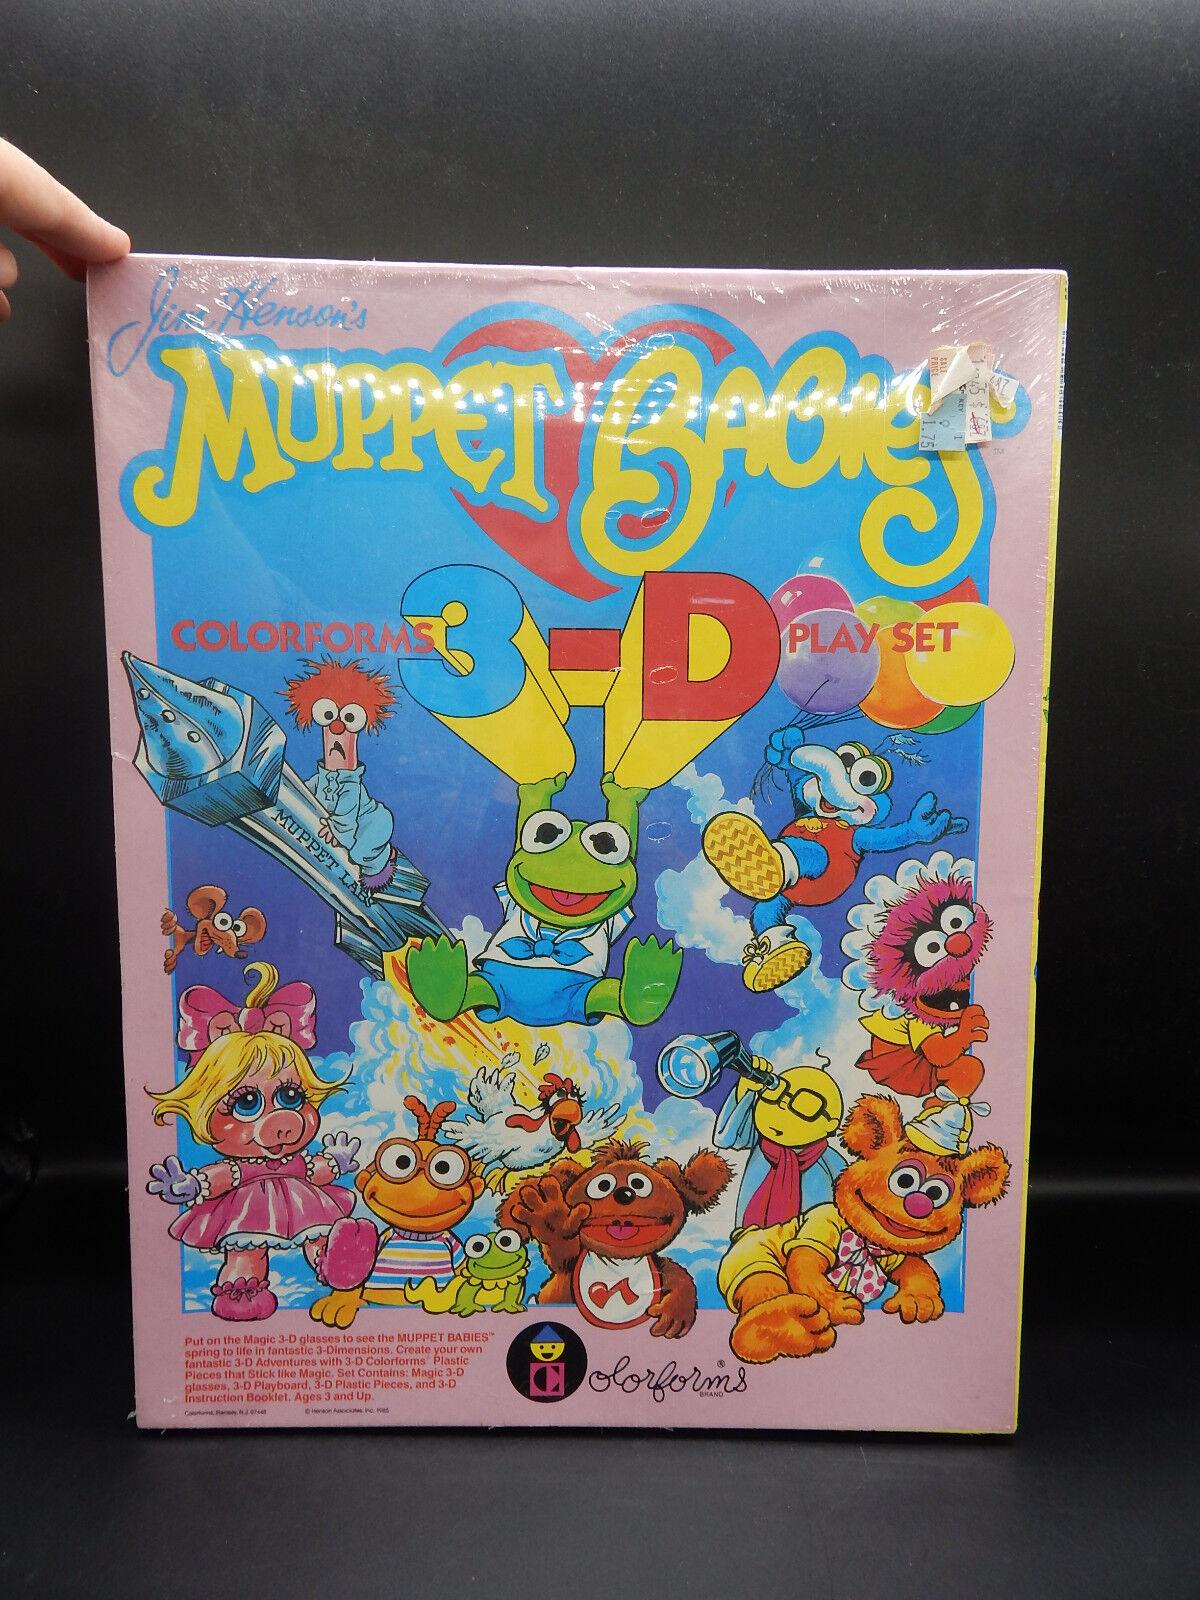 1985 vintage MUPPET BABIES Farbeforms 3-D play Set unused MIB Jim Henson Muppets